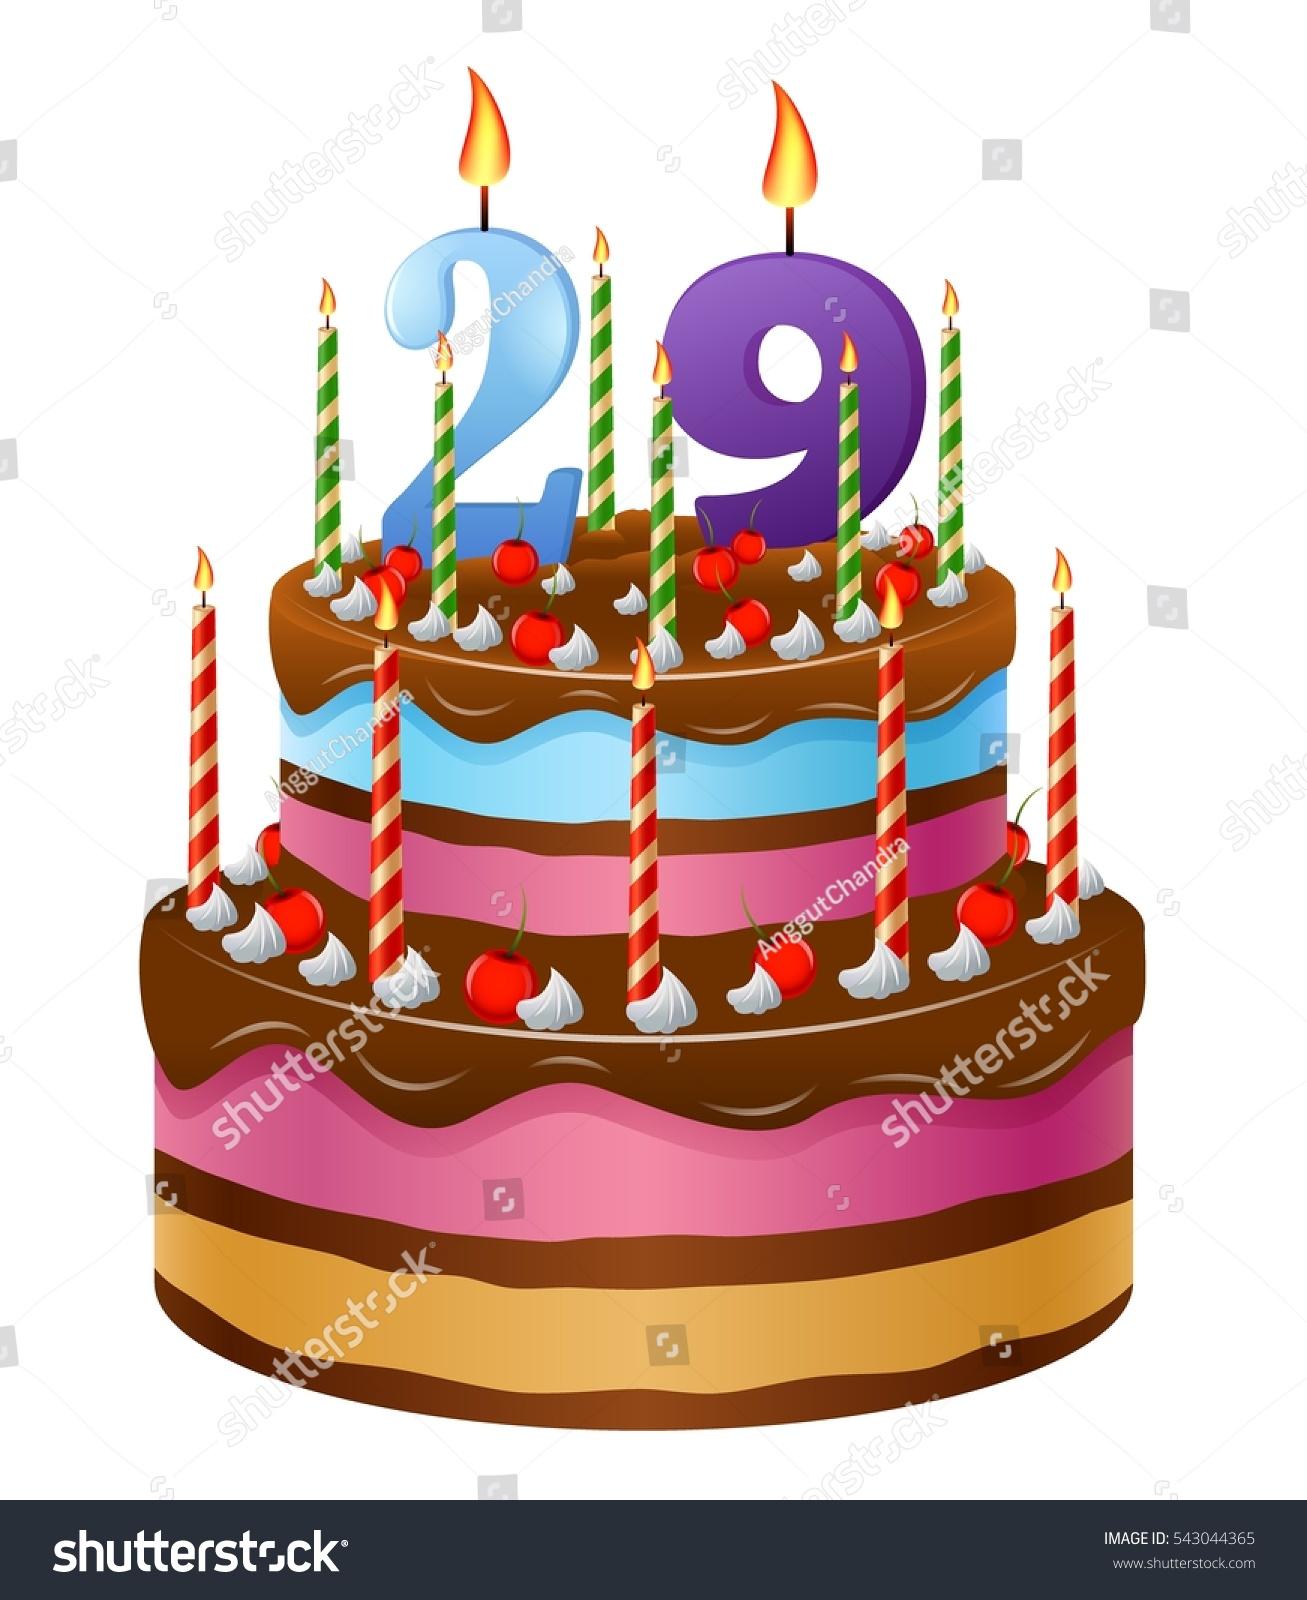 Happy Birthday Cake 29 Stock Illustration Royalty Free Stock